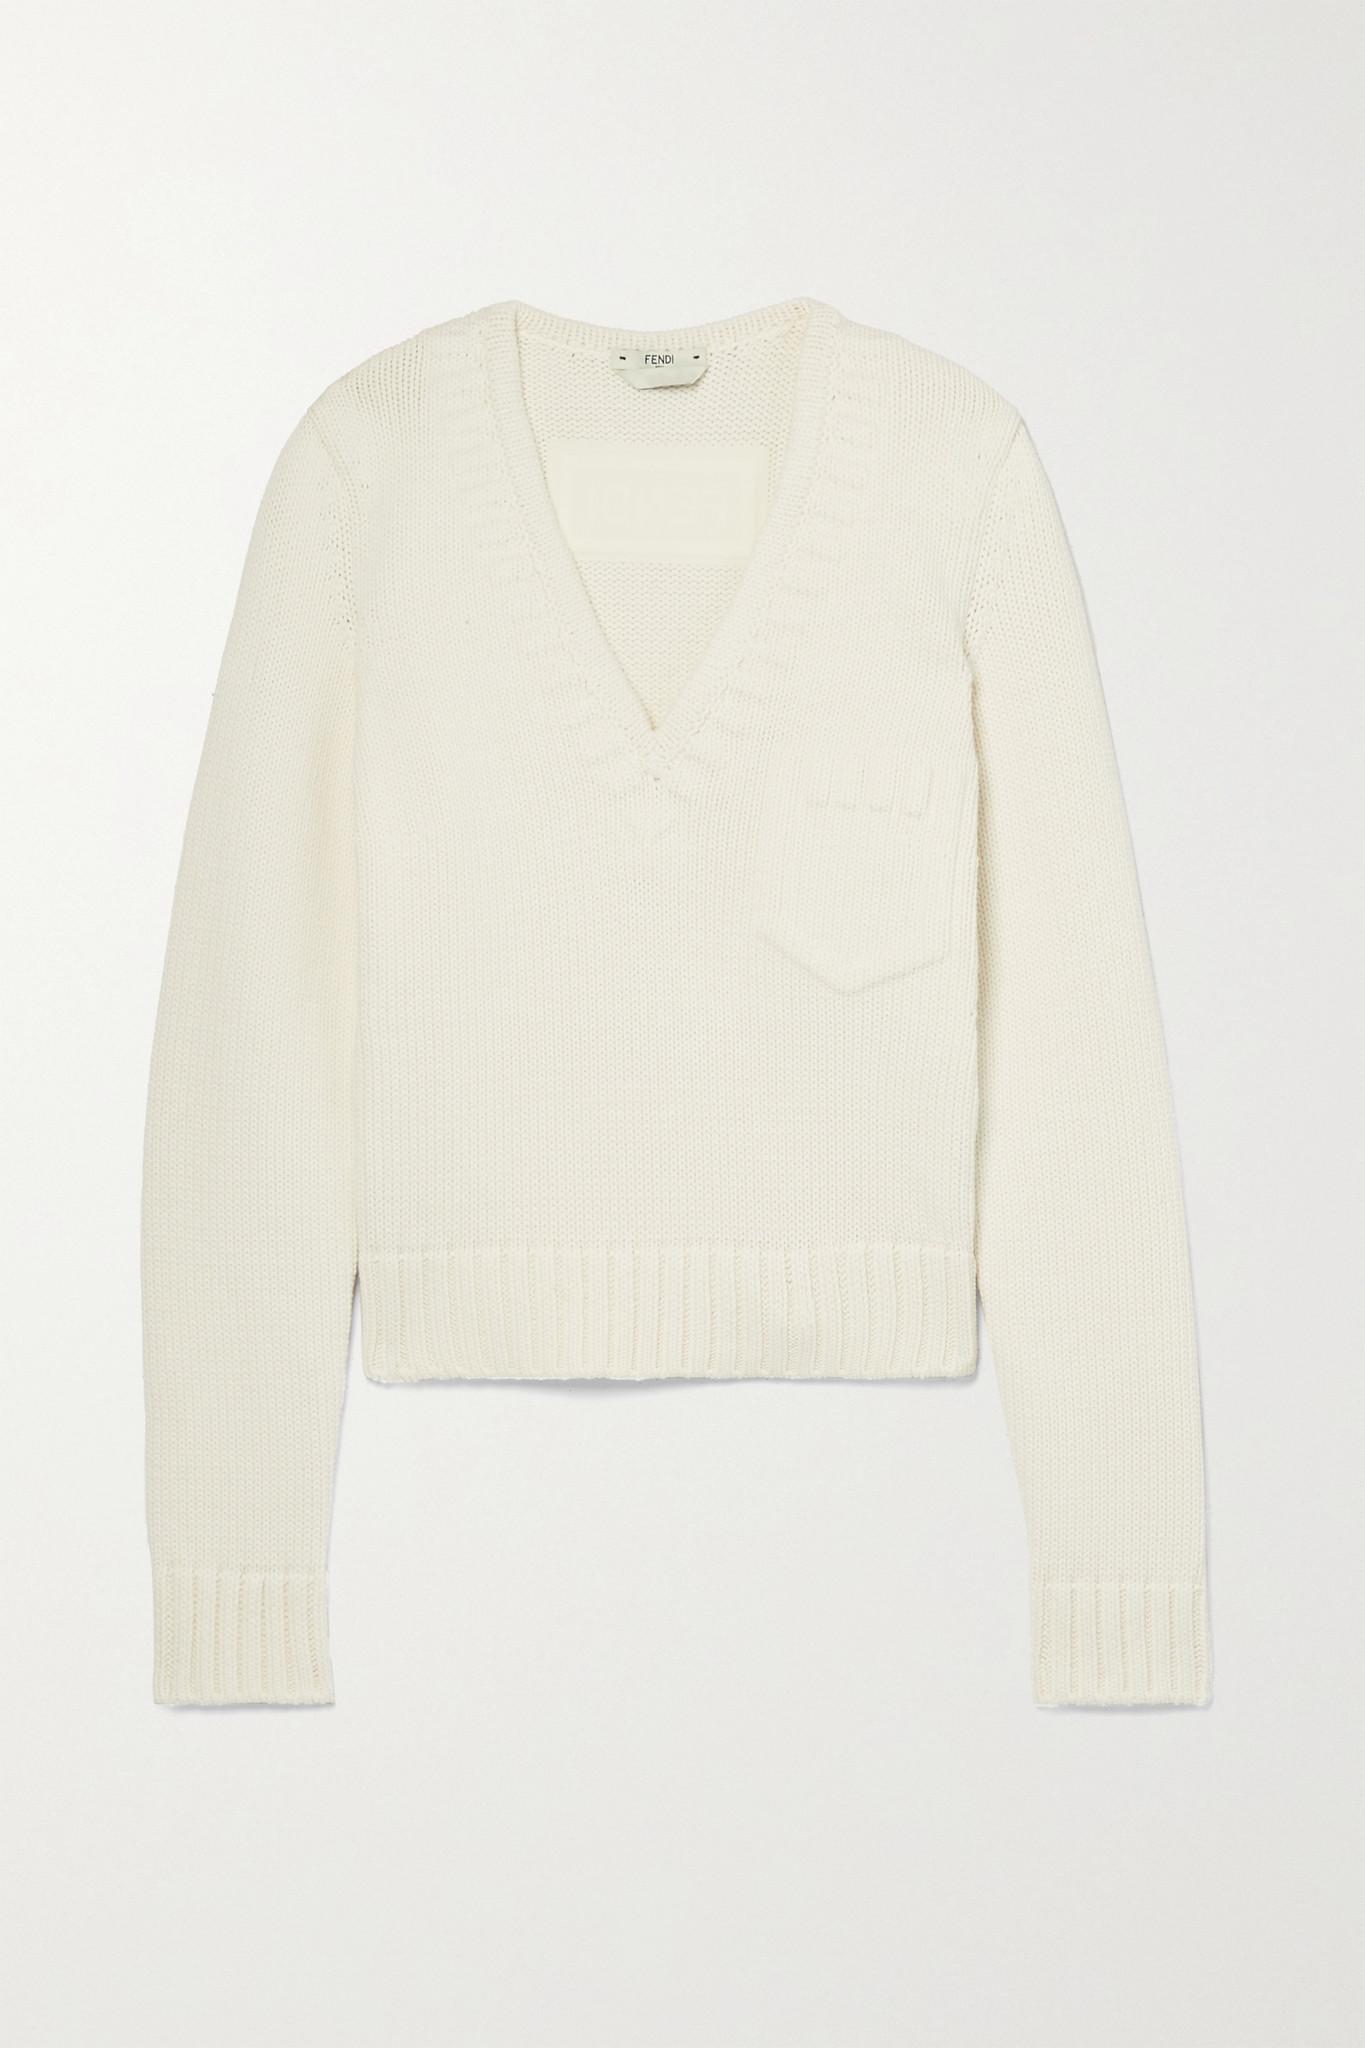 FENDI - 棉质混纺短款毛衣 - 米白色 - IT44